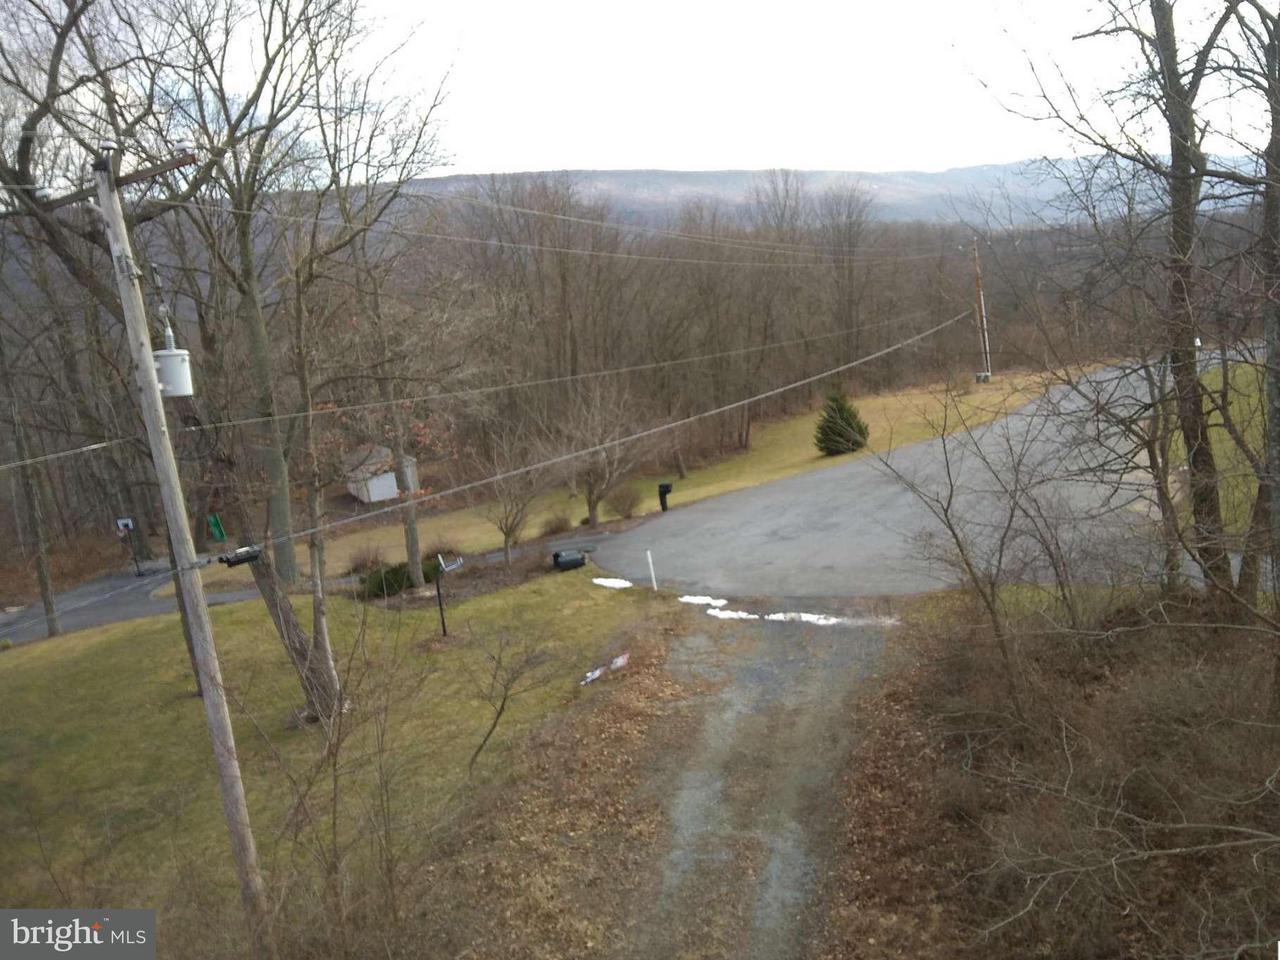 Land for Sale at 122 Raceway Cir Everett, Pennsylvania 15537 United States